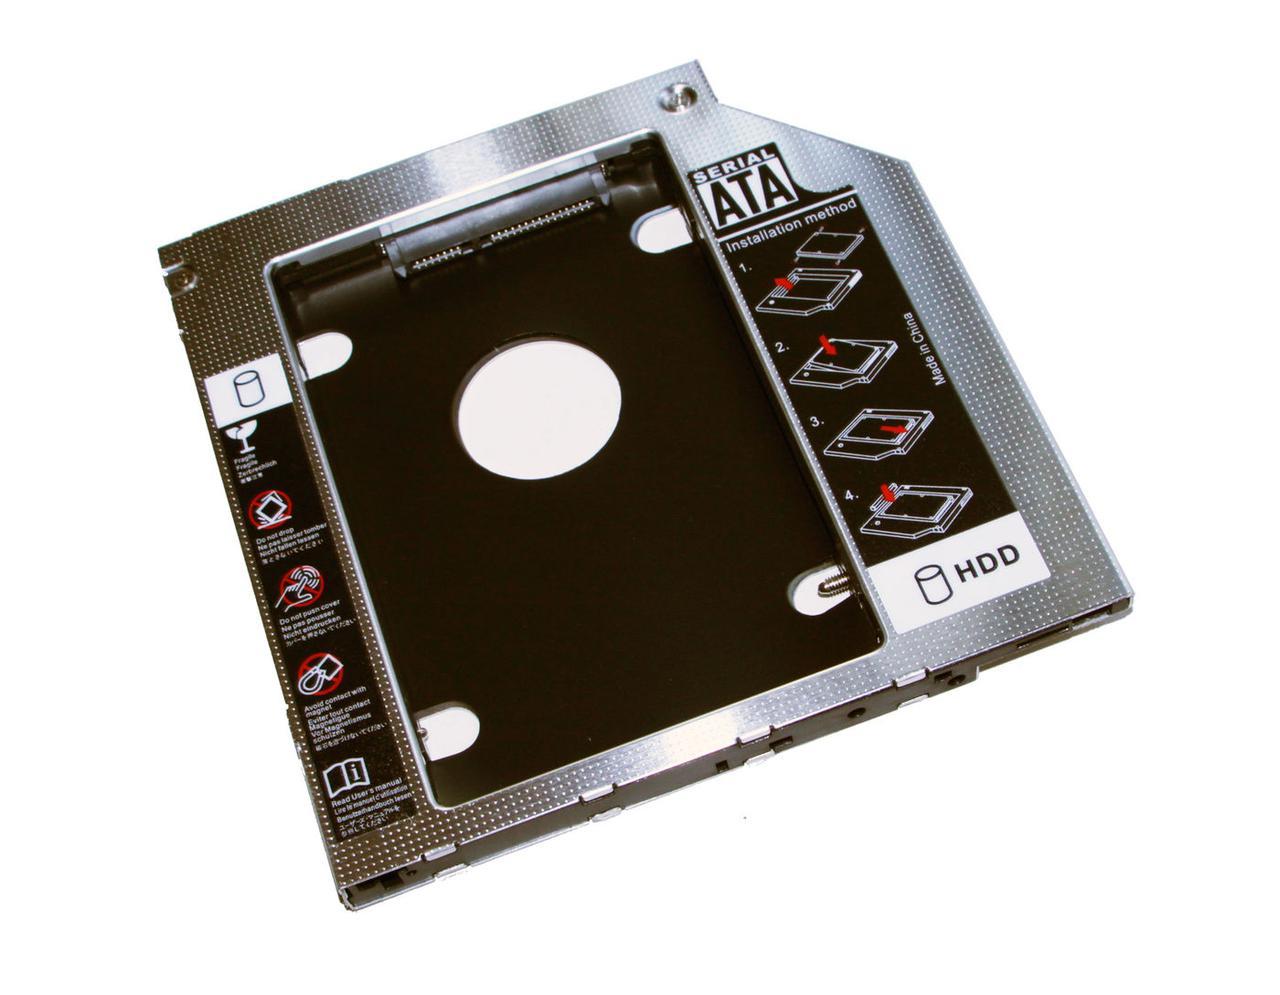 Шасси для ноутбука (Laptop 2nd HDD Frame) HQ-Tech HQ-HC09SA/BP, 9.5mm, SATA, алю